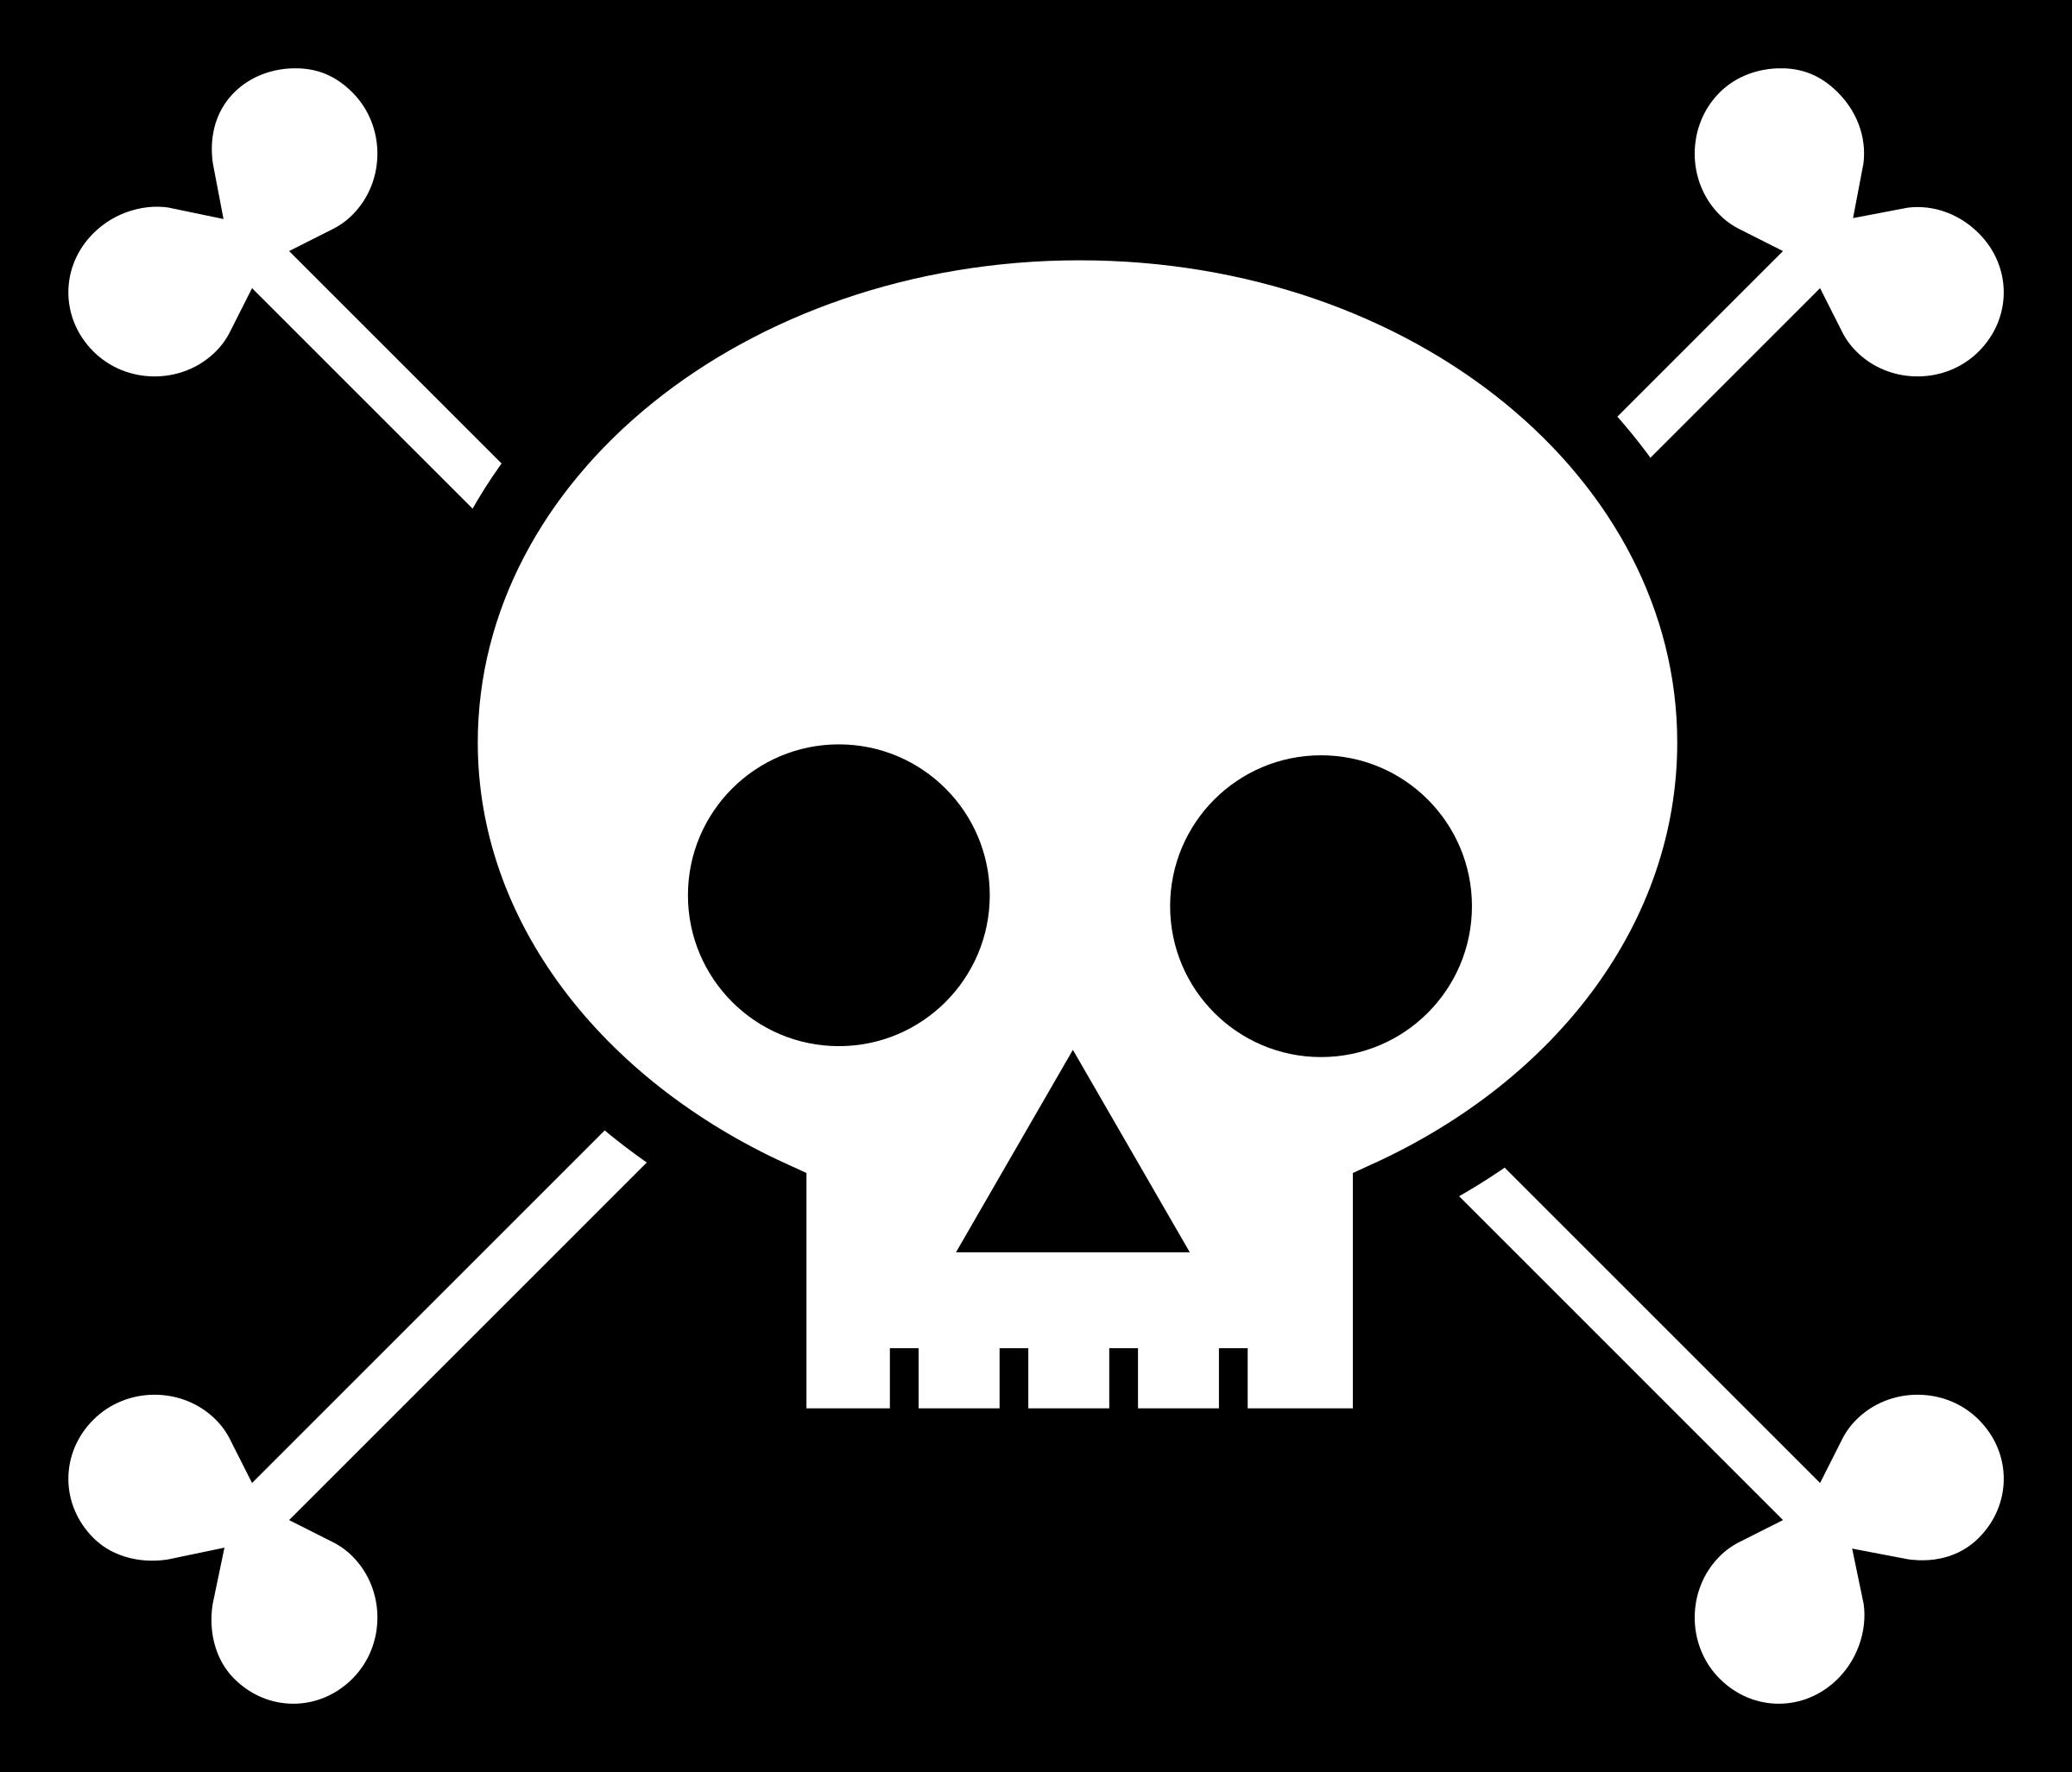 Skeleton simple